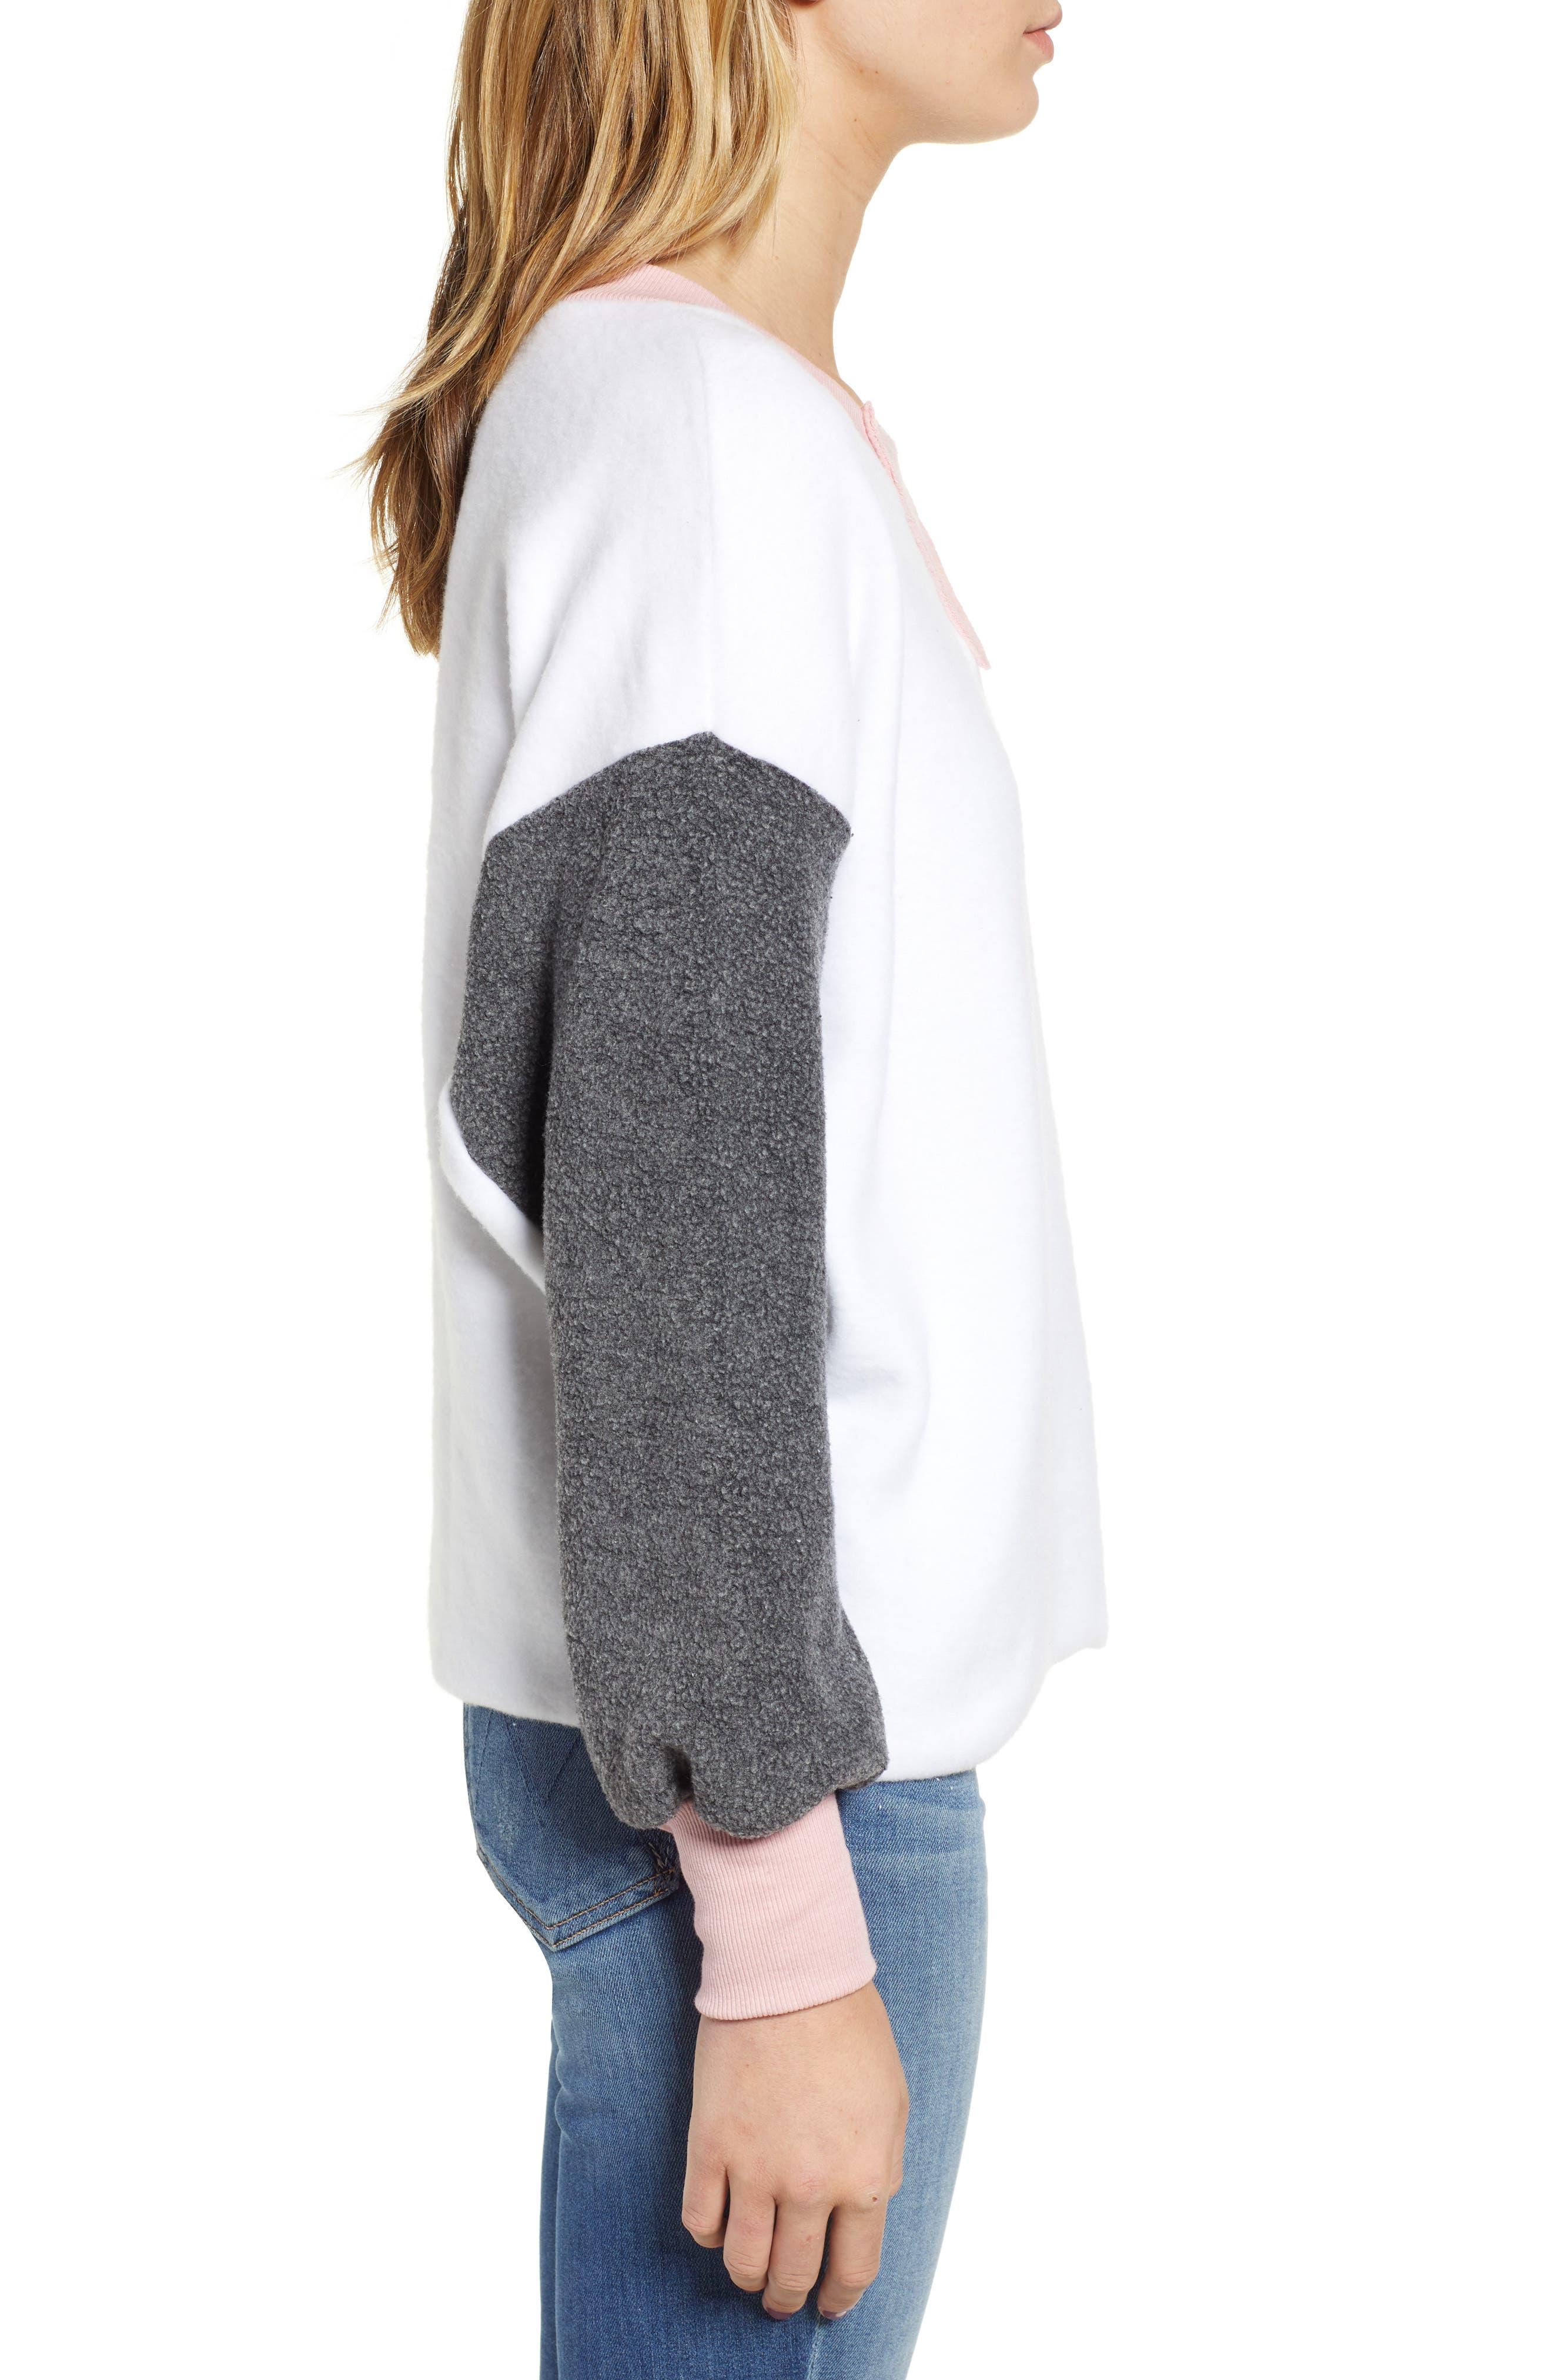 True Love Sweatshirt,                             Alternate thumbnail 3, color,                             CLEAN WHITE MULTI